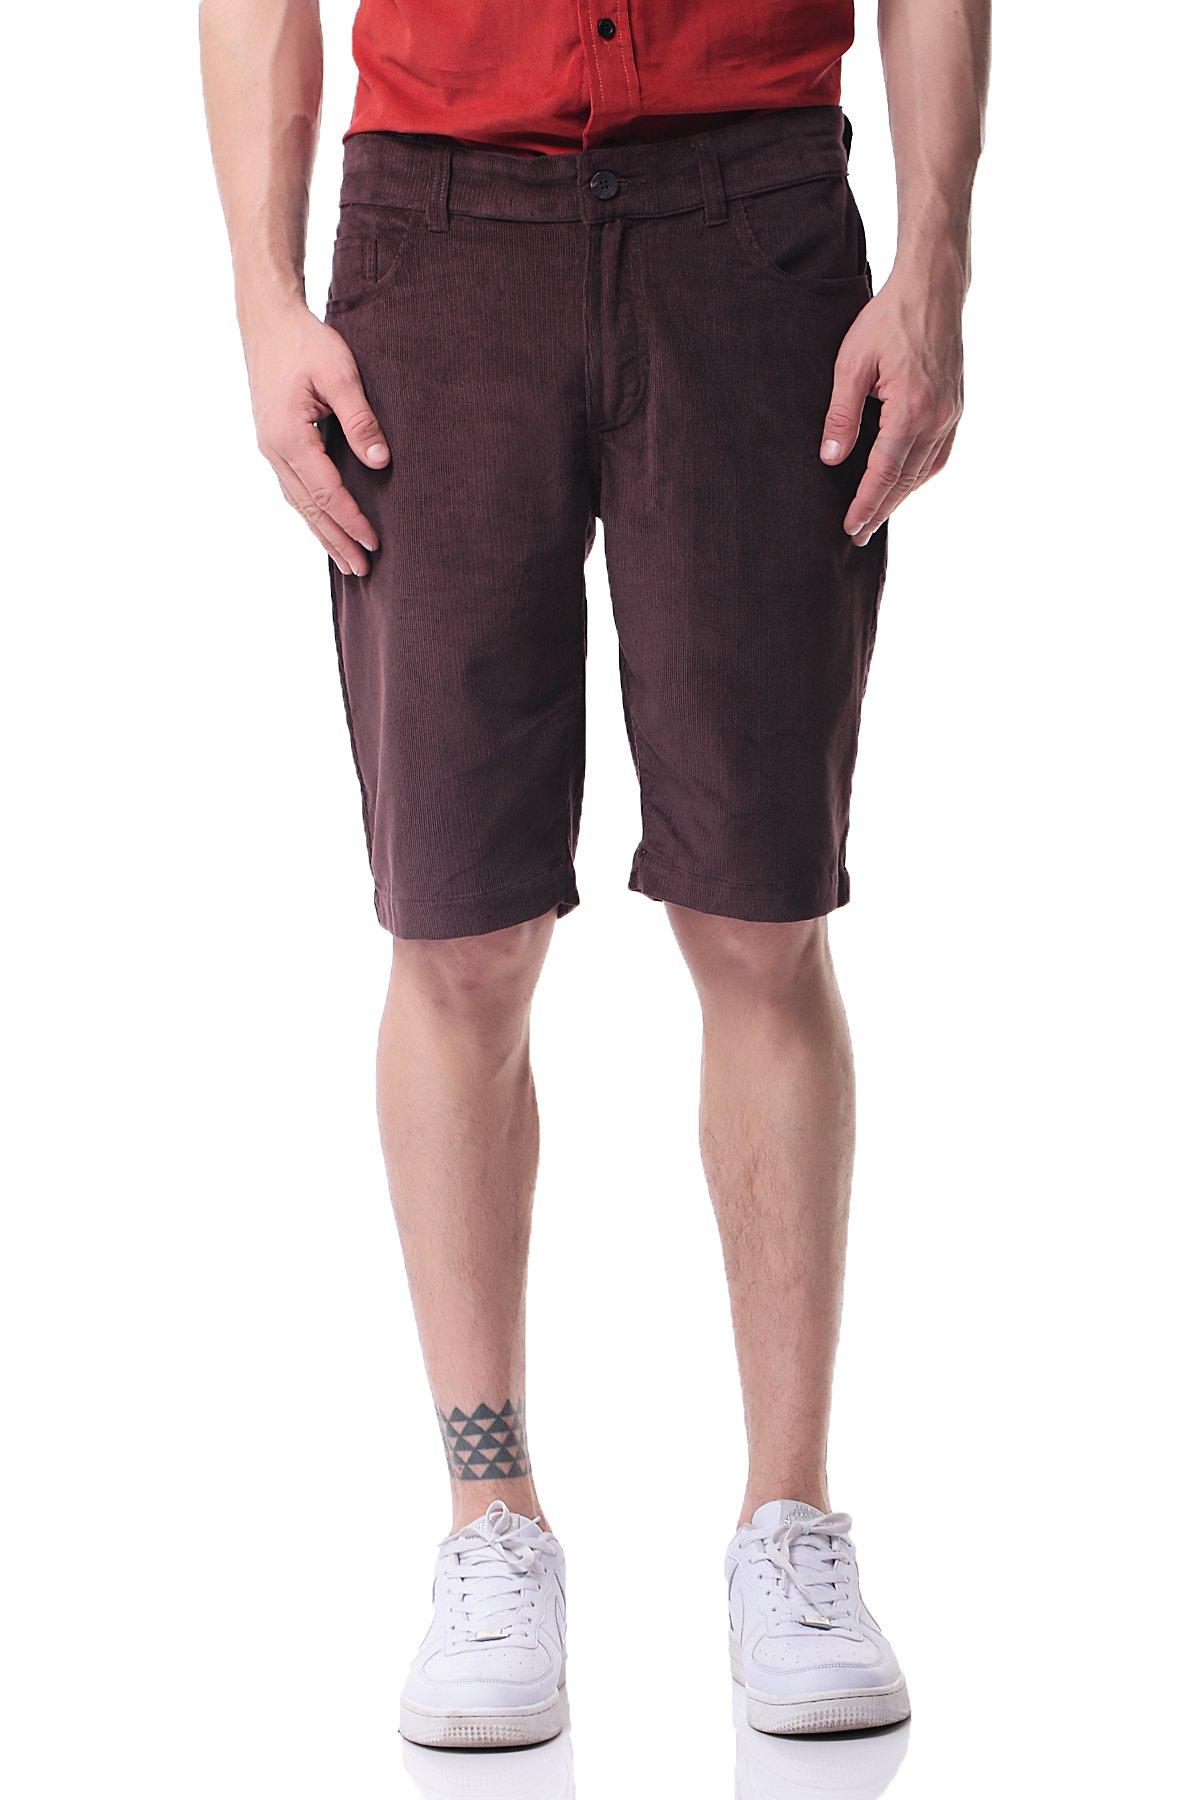 Pau1Hami1ton PH-19 Mens Corduroy Shorts Casual Slim Fit Flat Front(34, Brown)